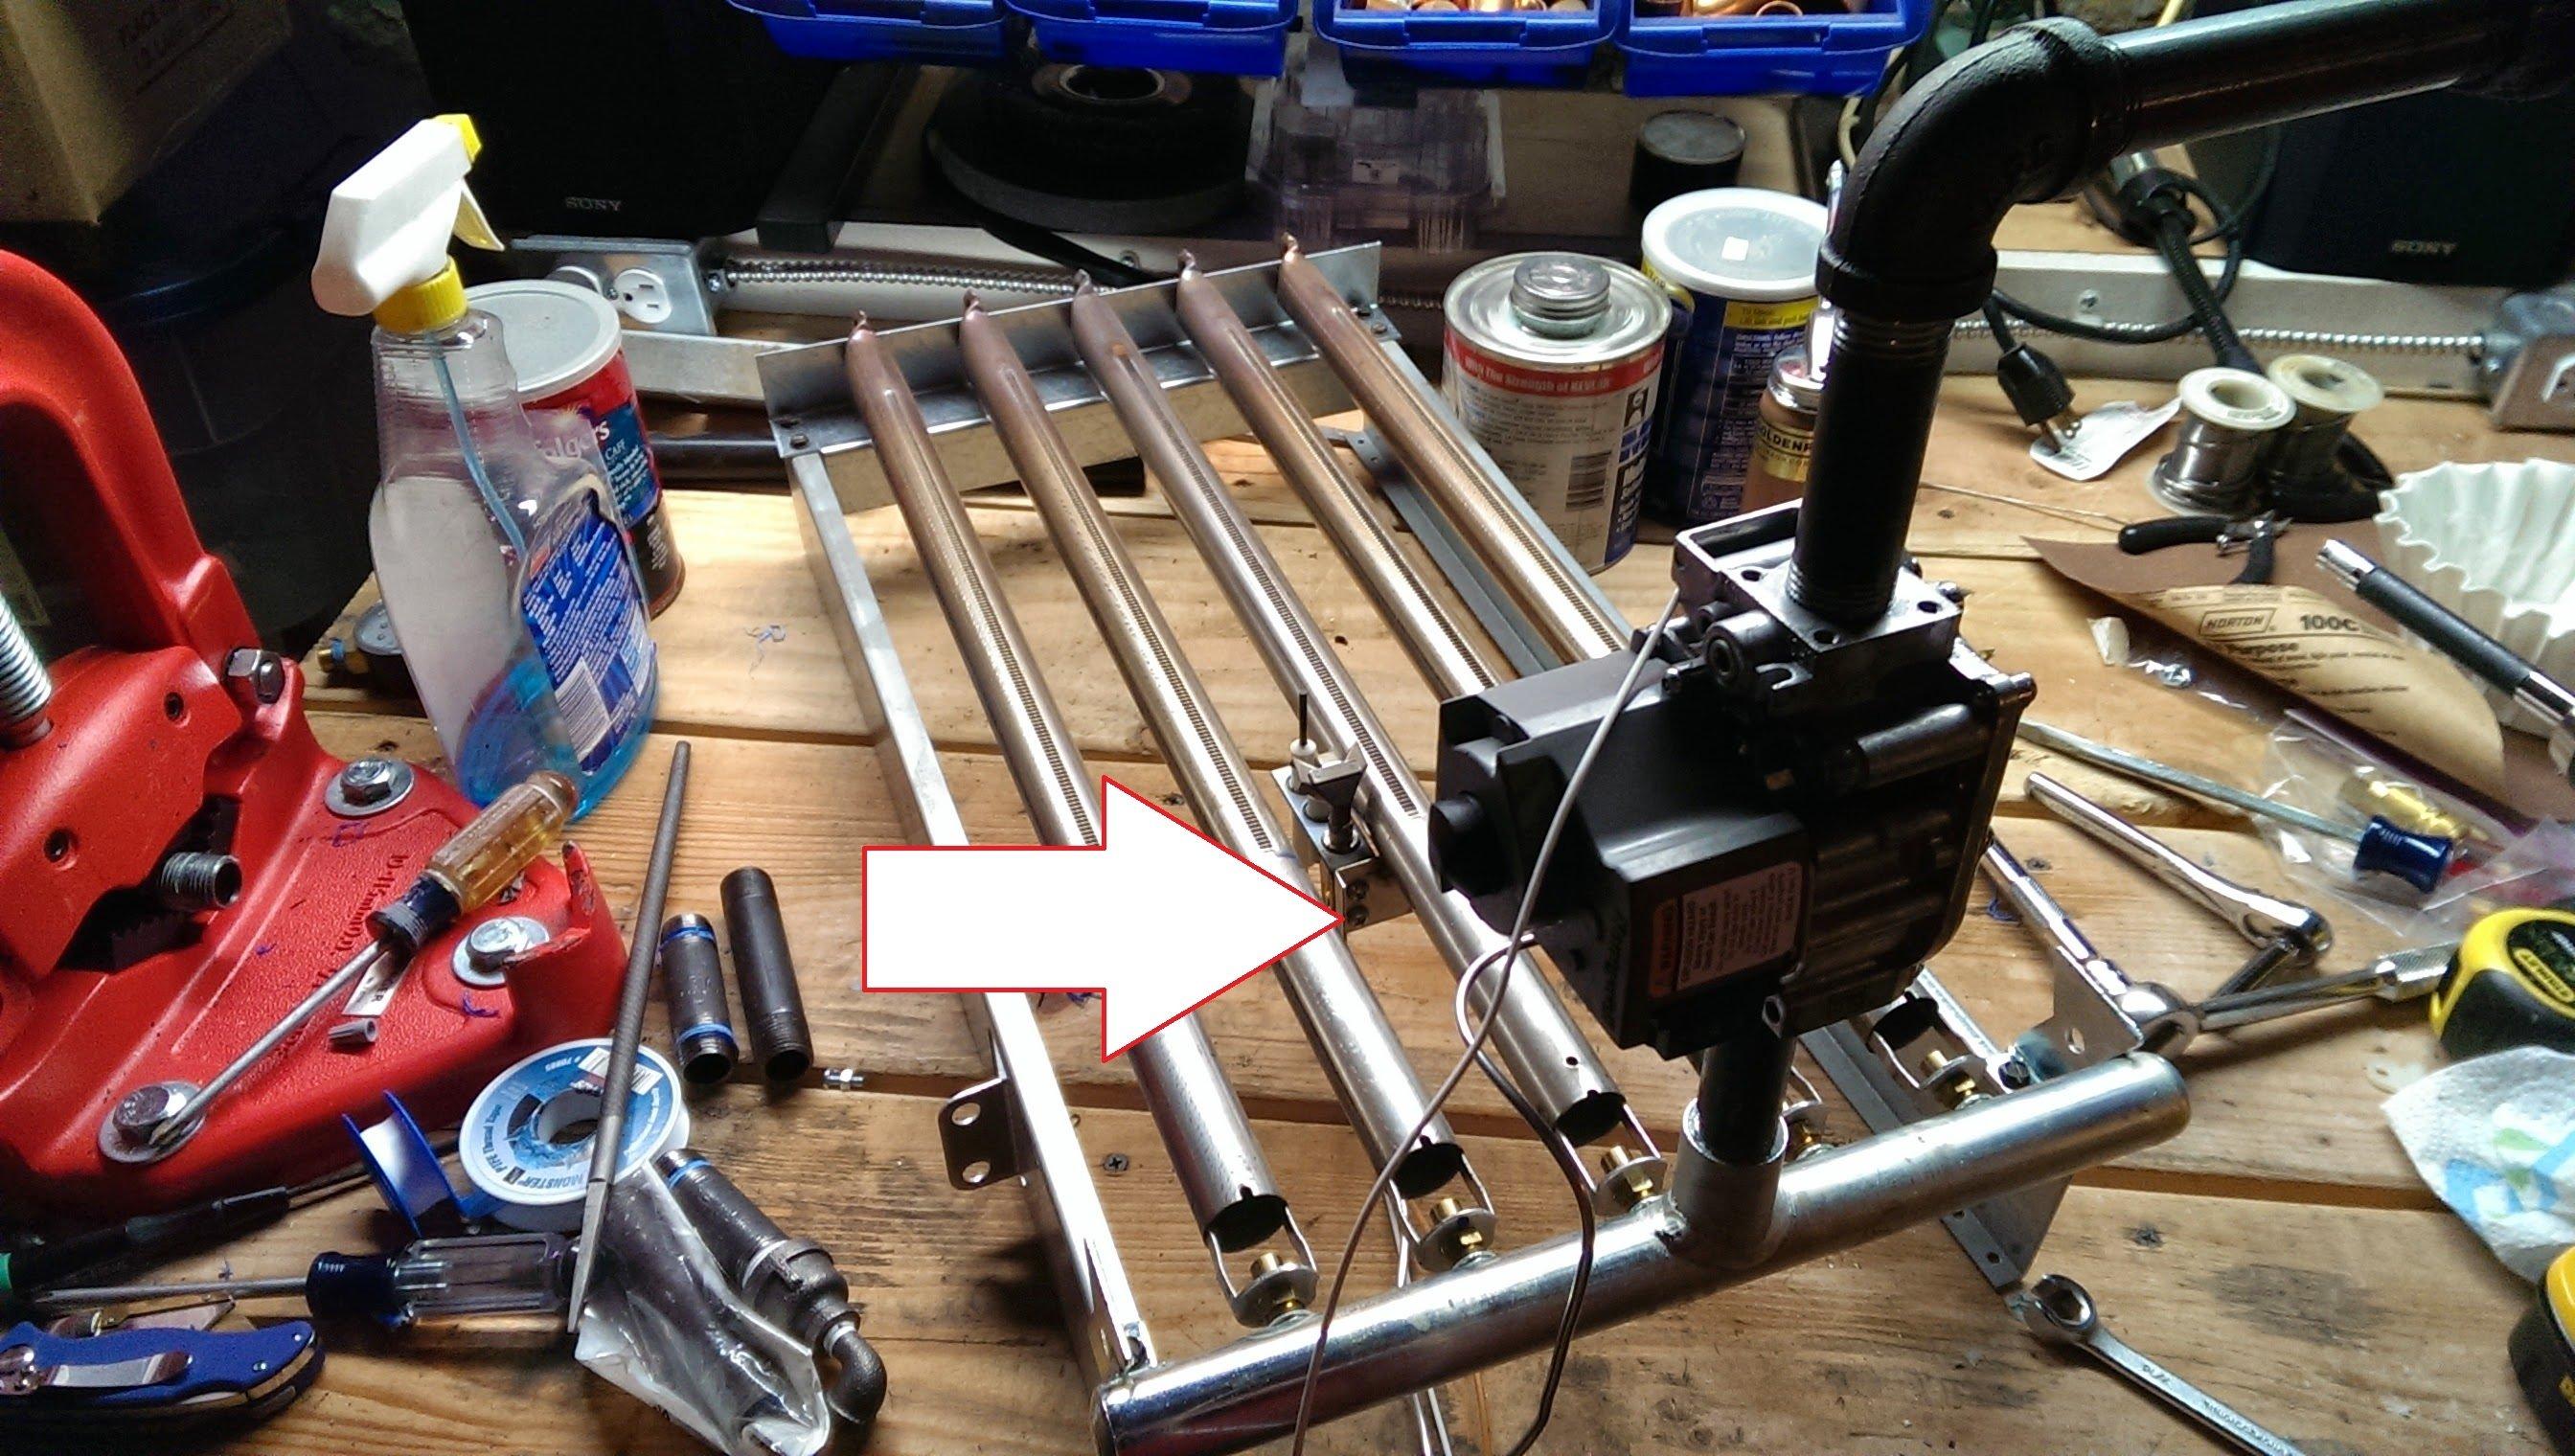 Amazing Weil Mclain Parts Distributors Images - The Best Electrical ...